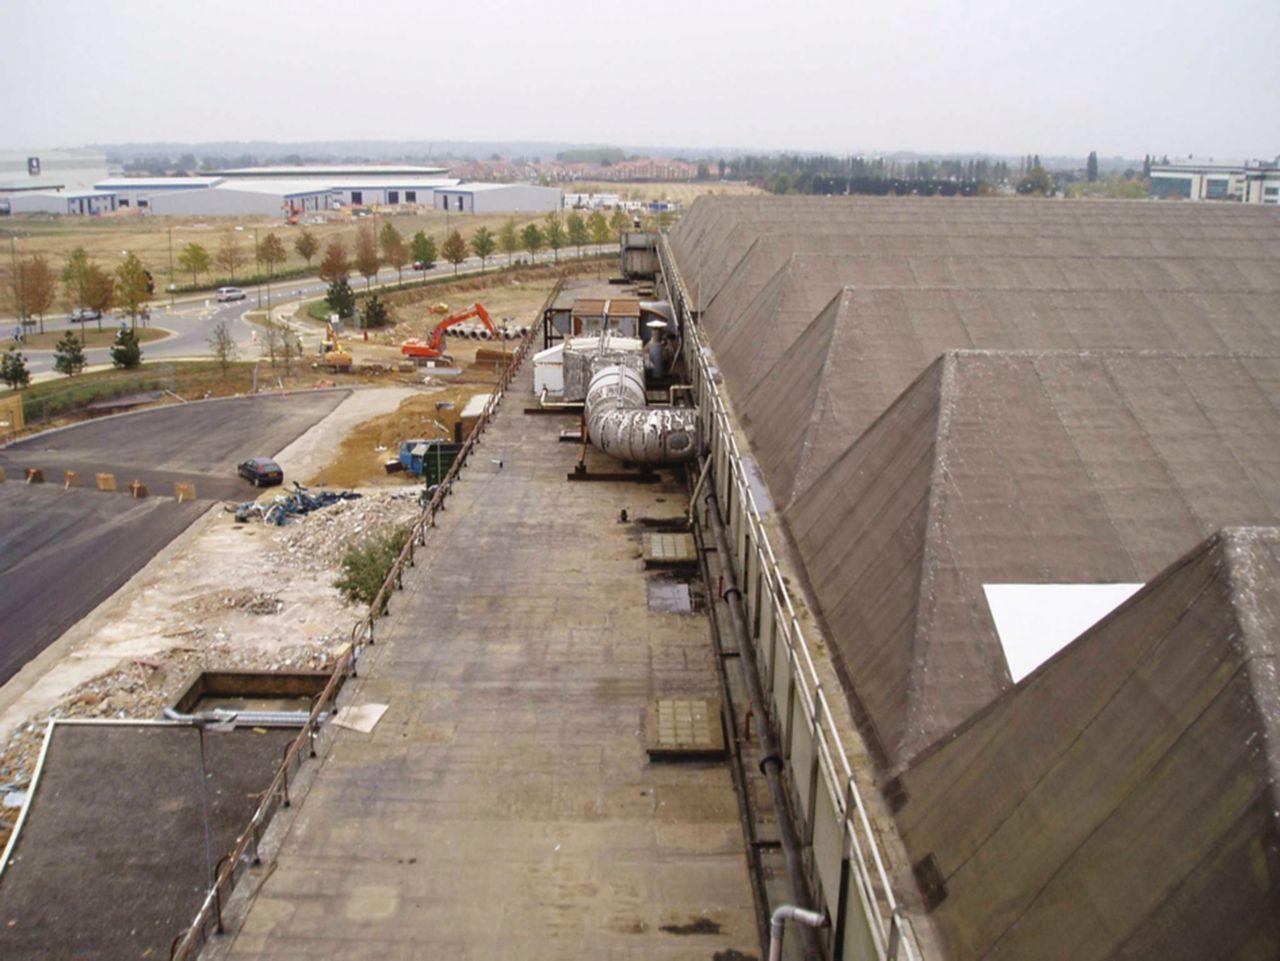 Comet hangar roof before renovation of bitumen roof